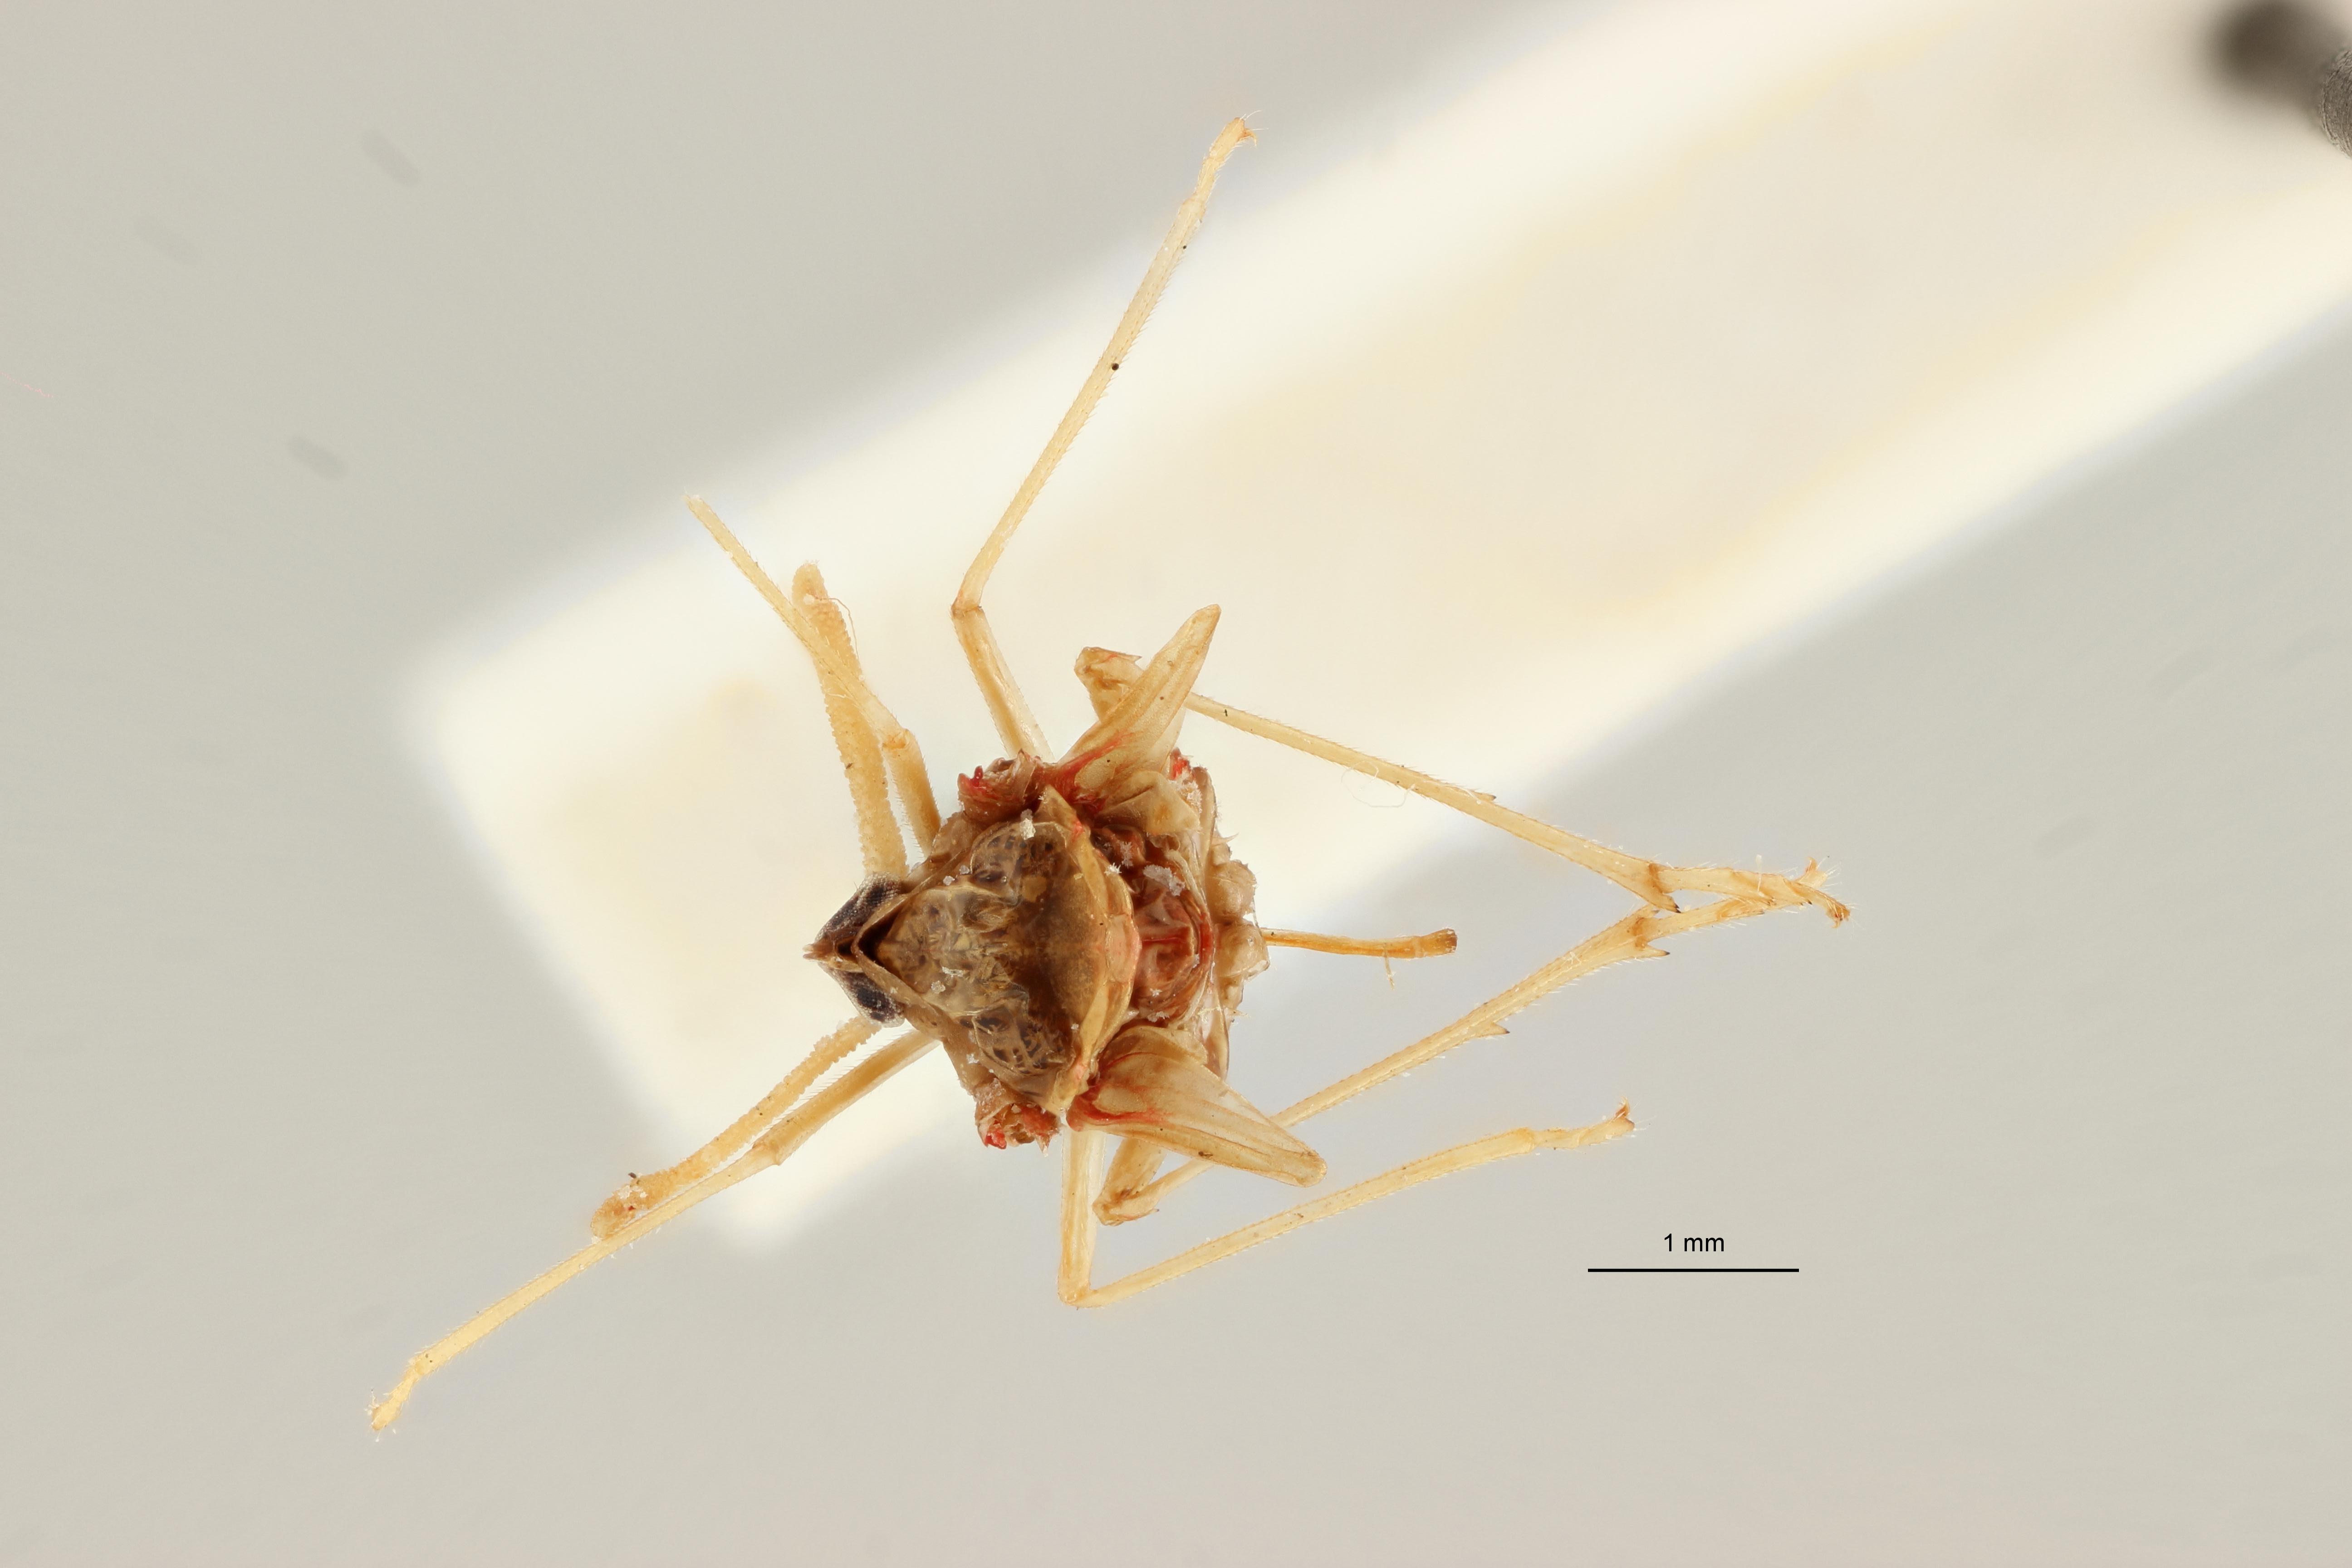 Zoraida (Zoraida) angolensis pt D ZS PMax Scaled.jpeg